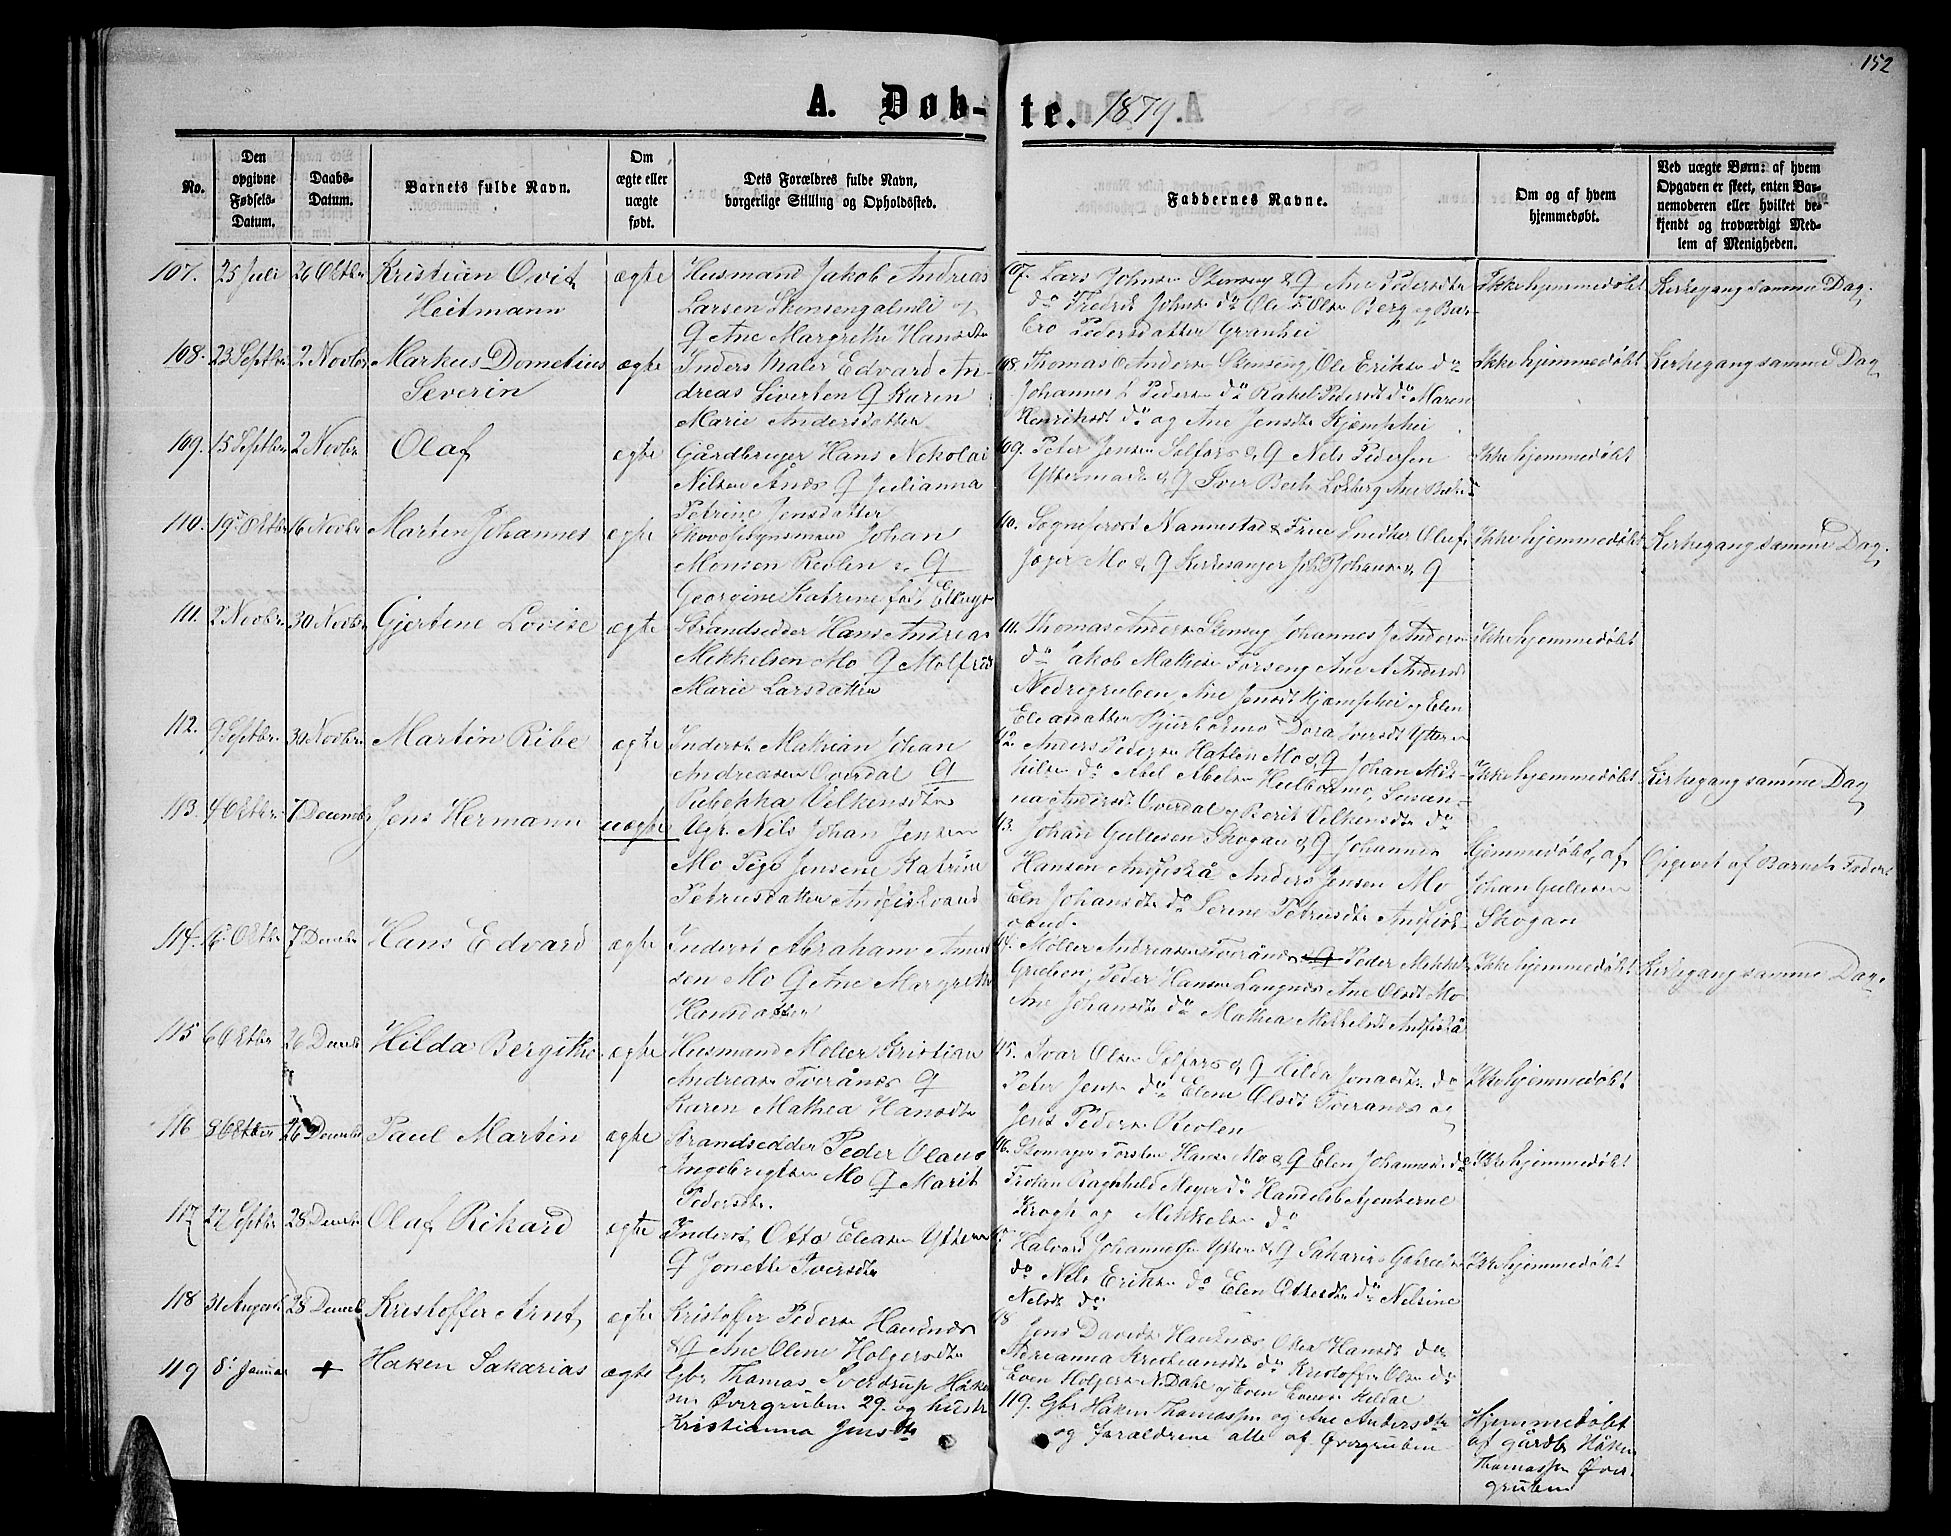 SAT, Ministerialprotokoller, klokkerbøker og fødselsregistre - Nordland, 827/L0415: Klokkerbok nr. 827C04, 1864-1886, s. 152